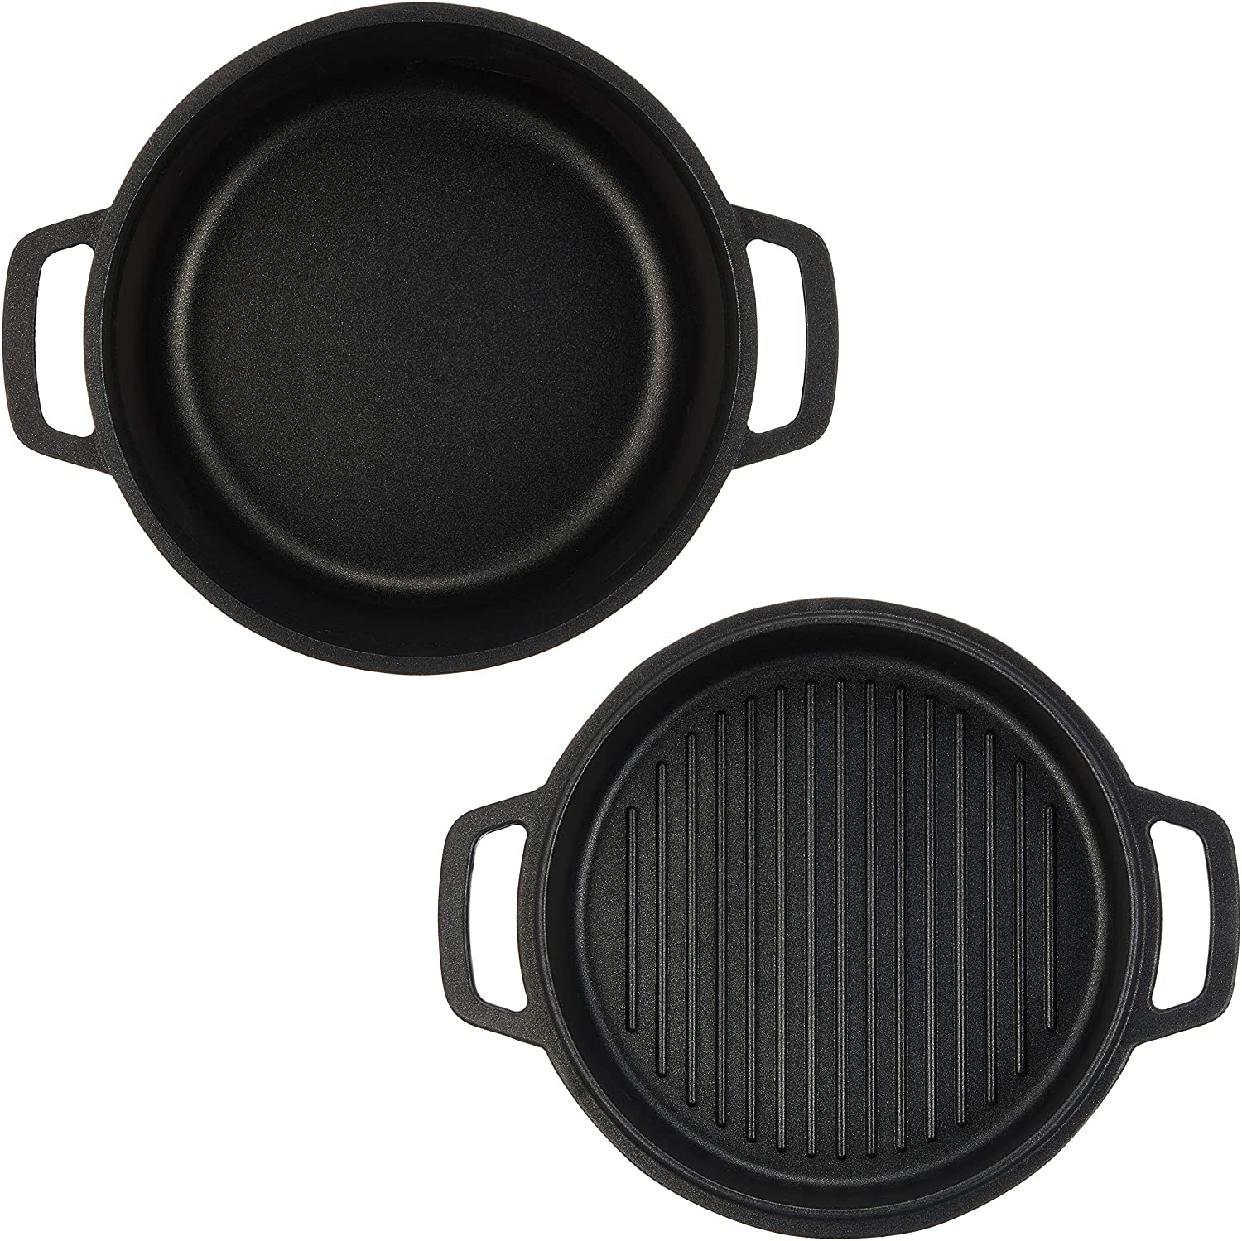 cotta(コッタ) 無水調理鍋 20cmの商品画像4